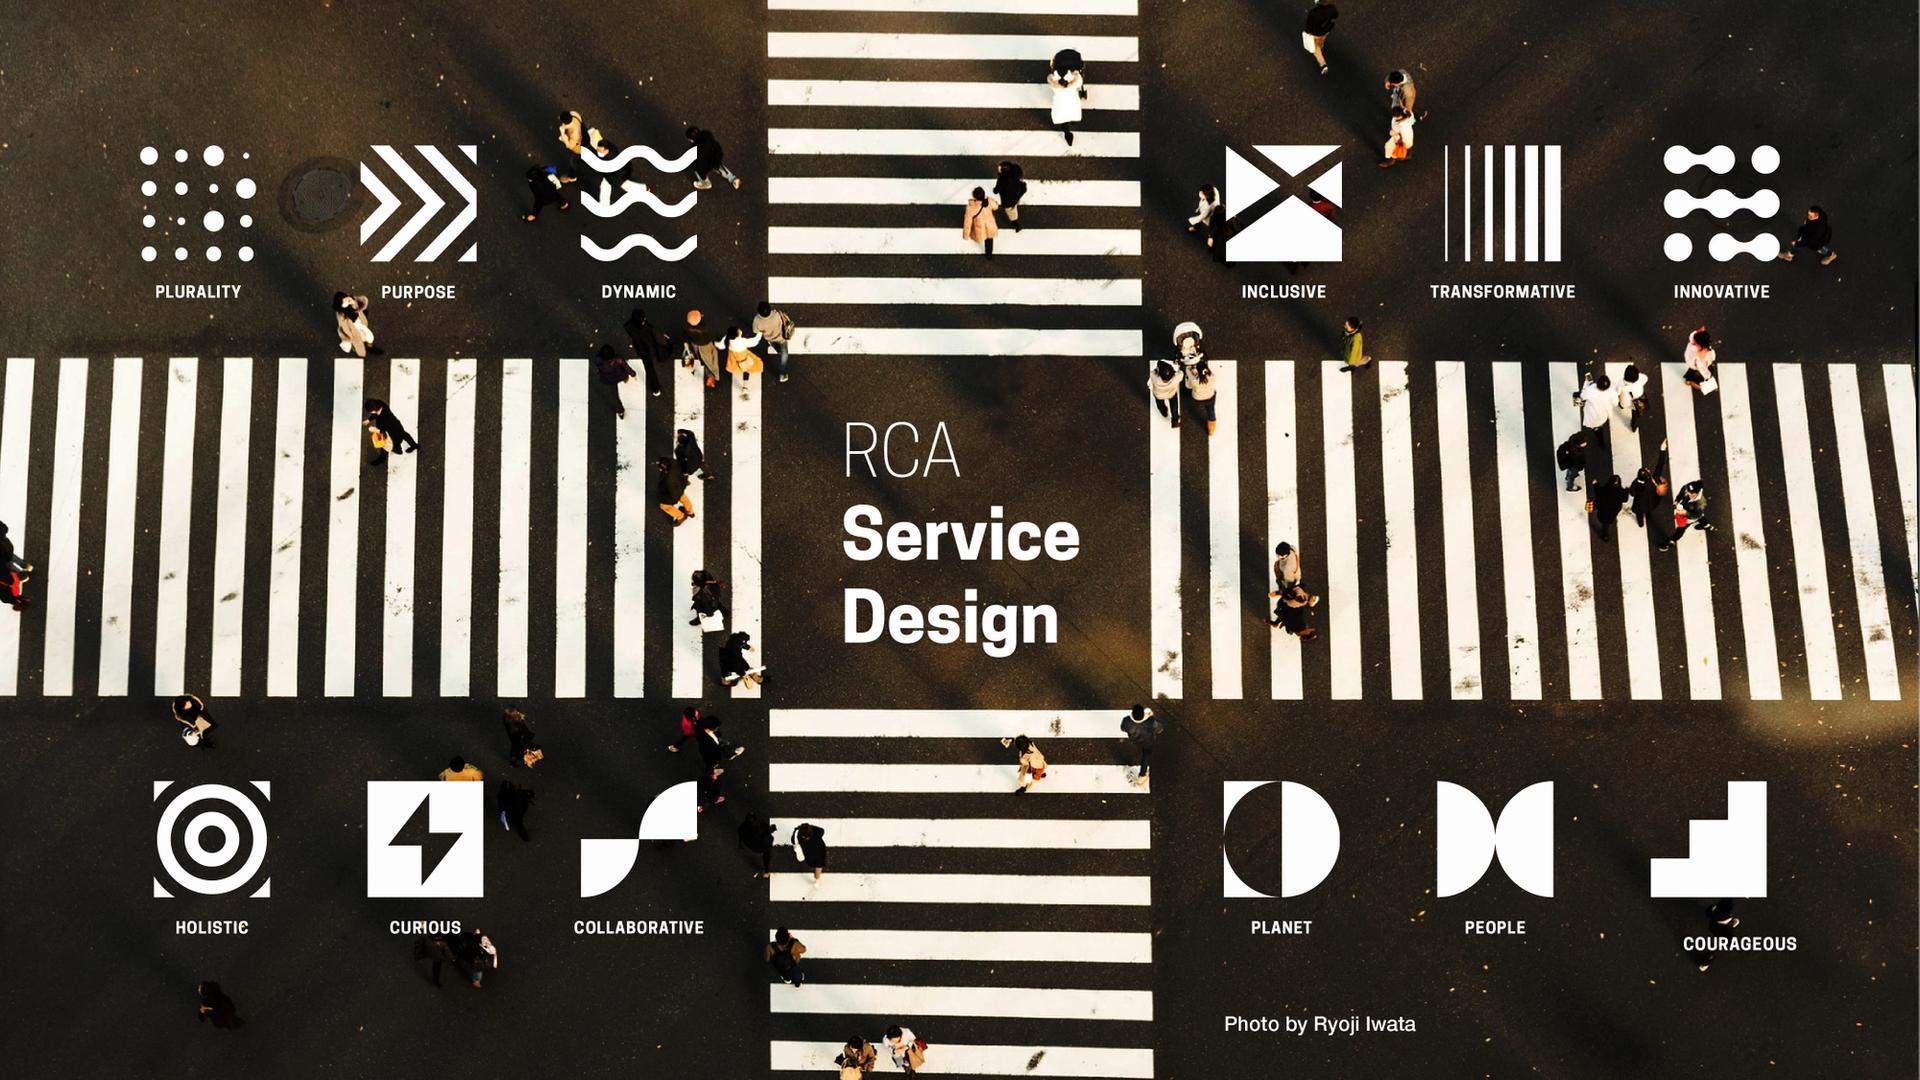 Service Design event image